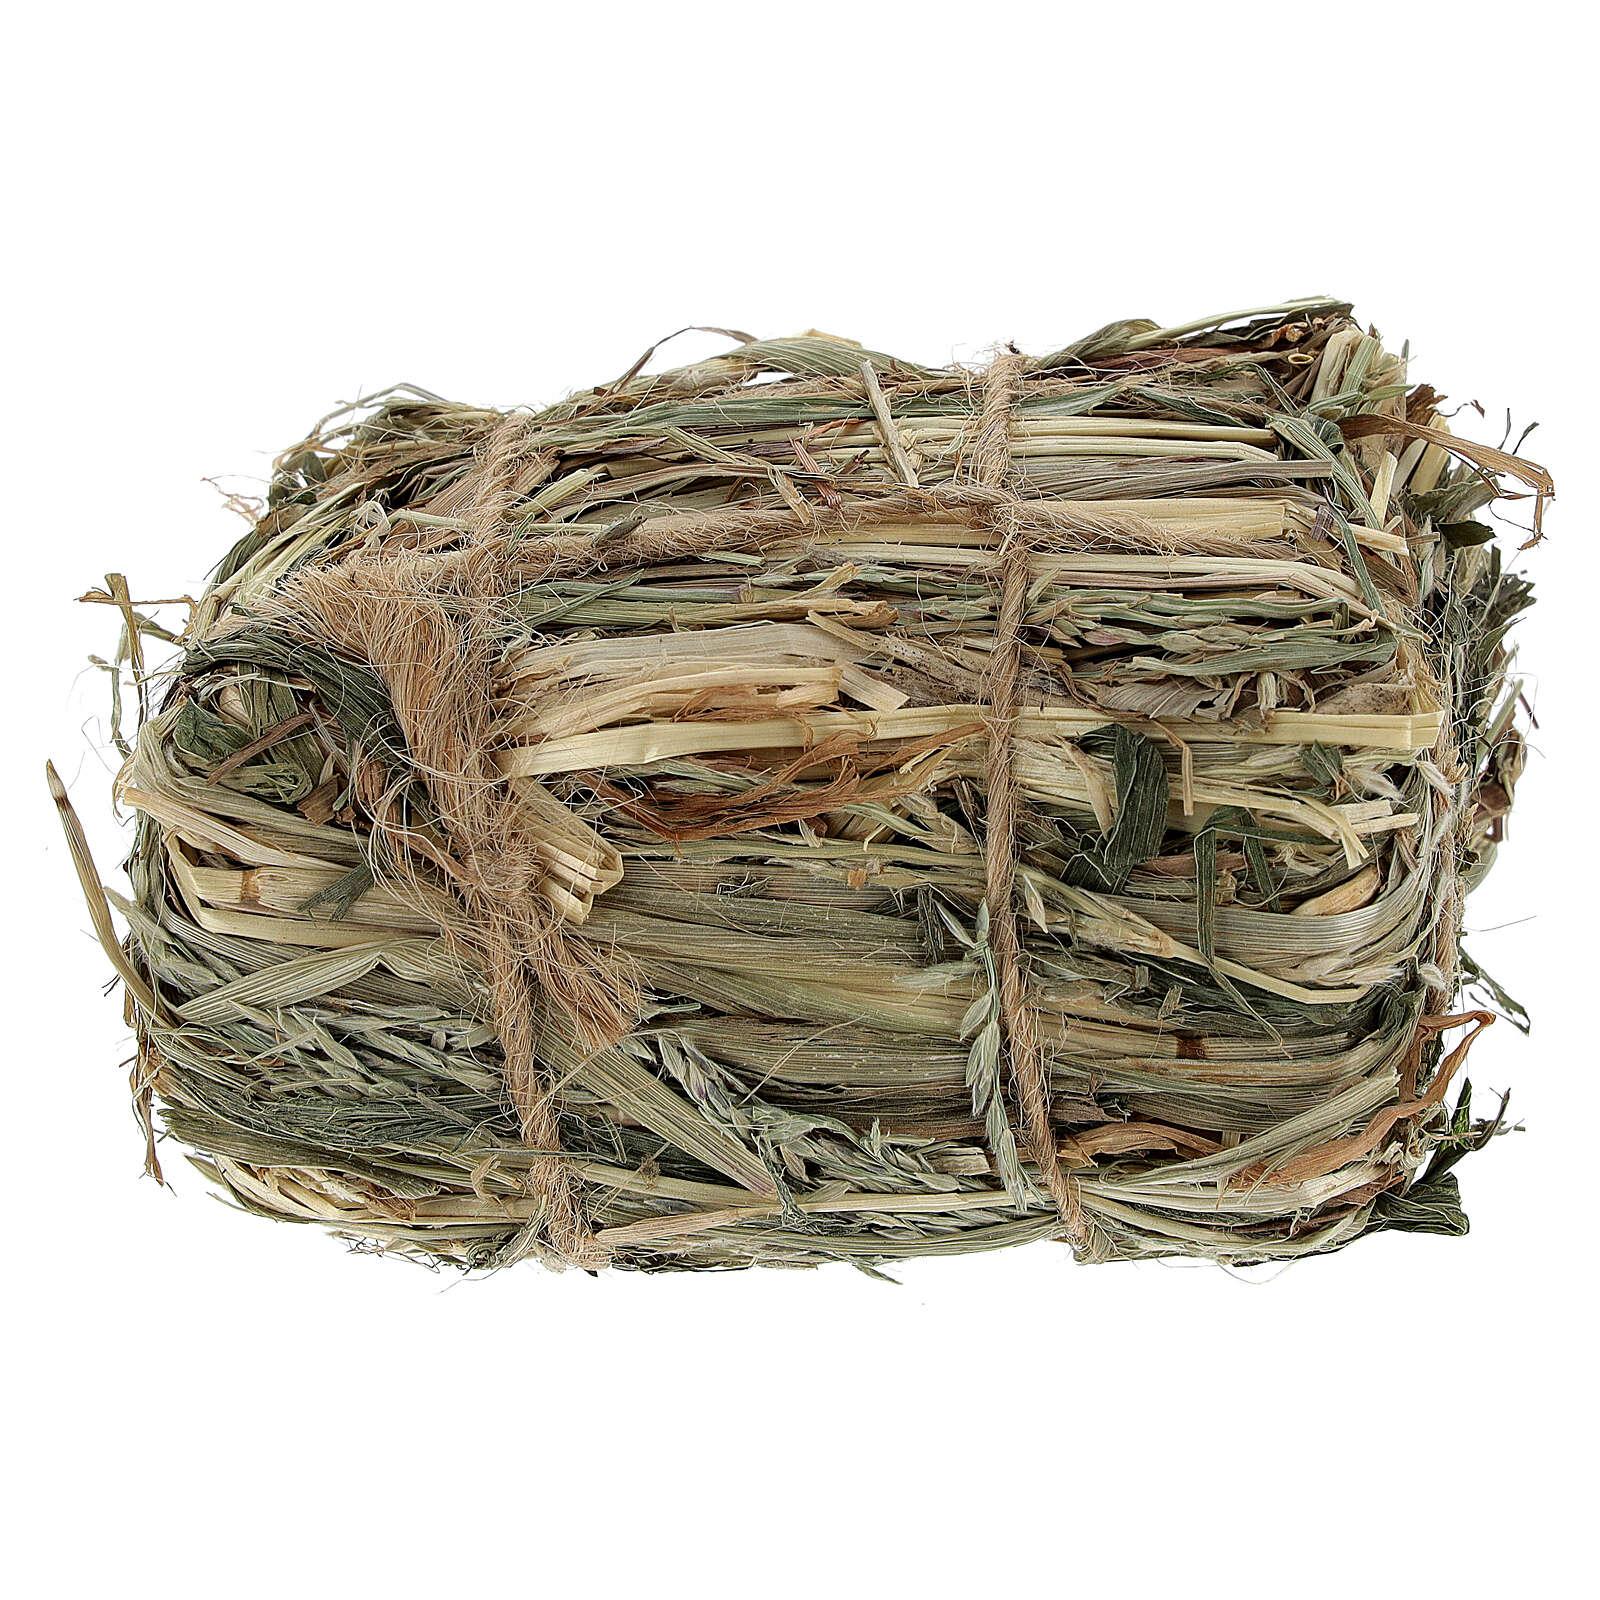 Bale of hay 4x7x5 cm Nativity scene 8-10-12 cm 4